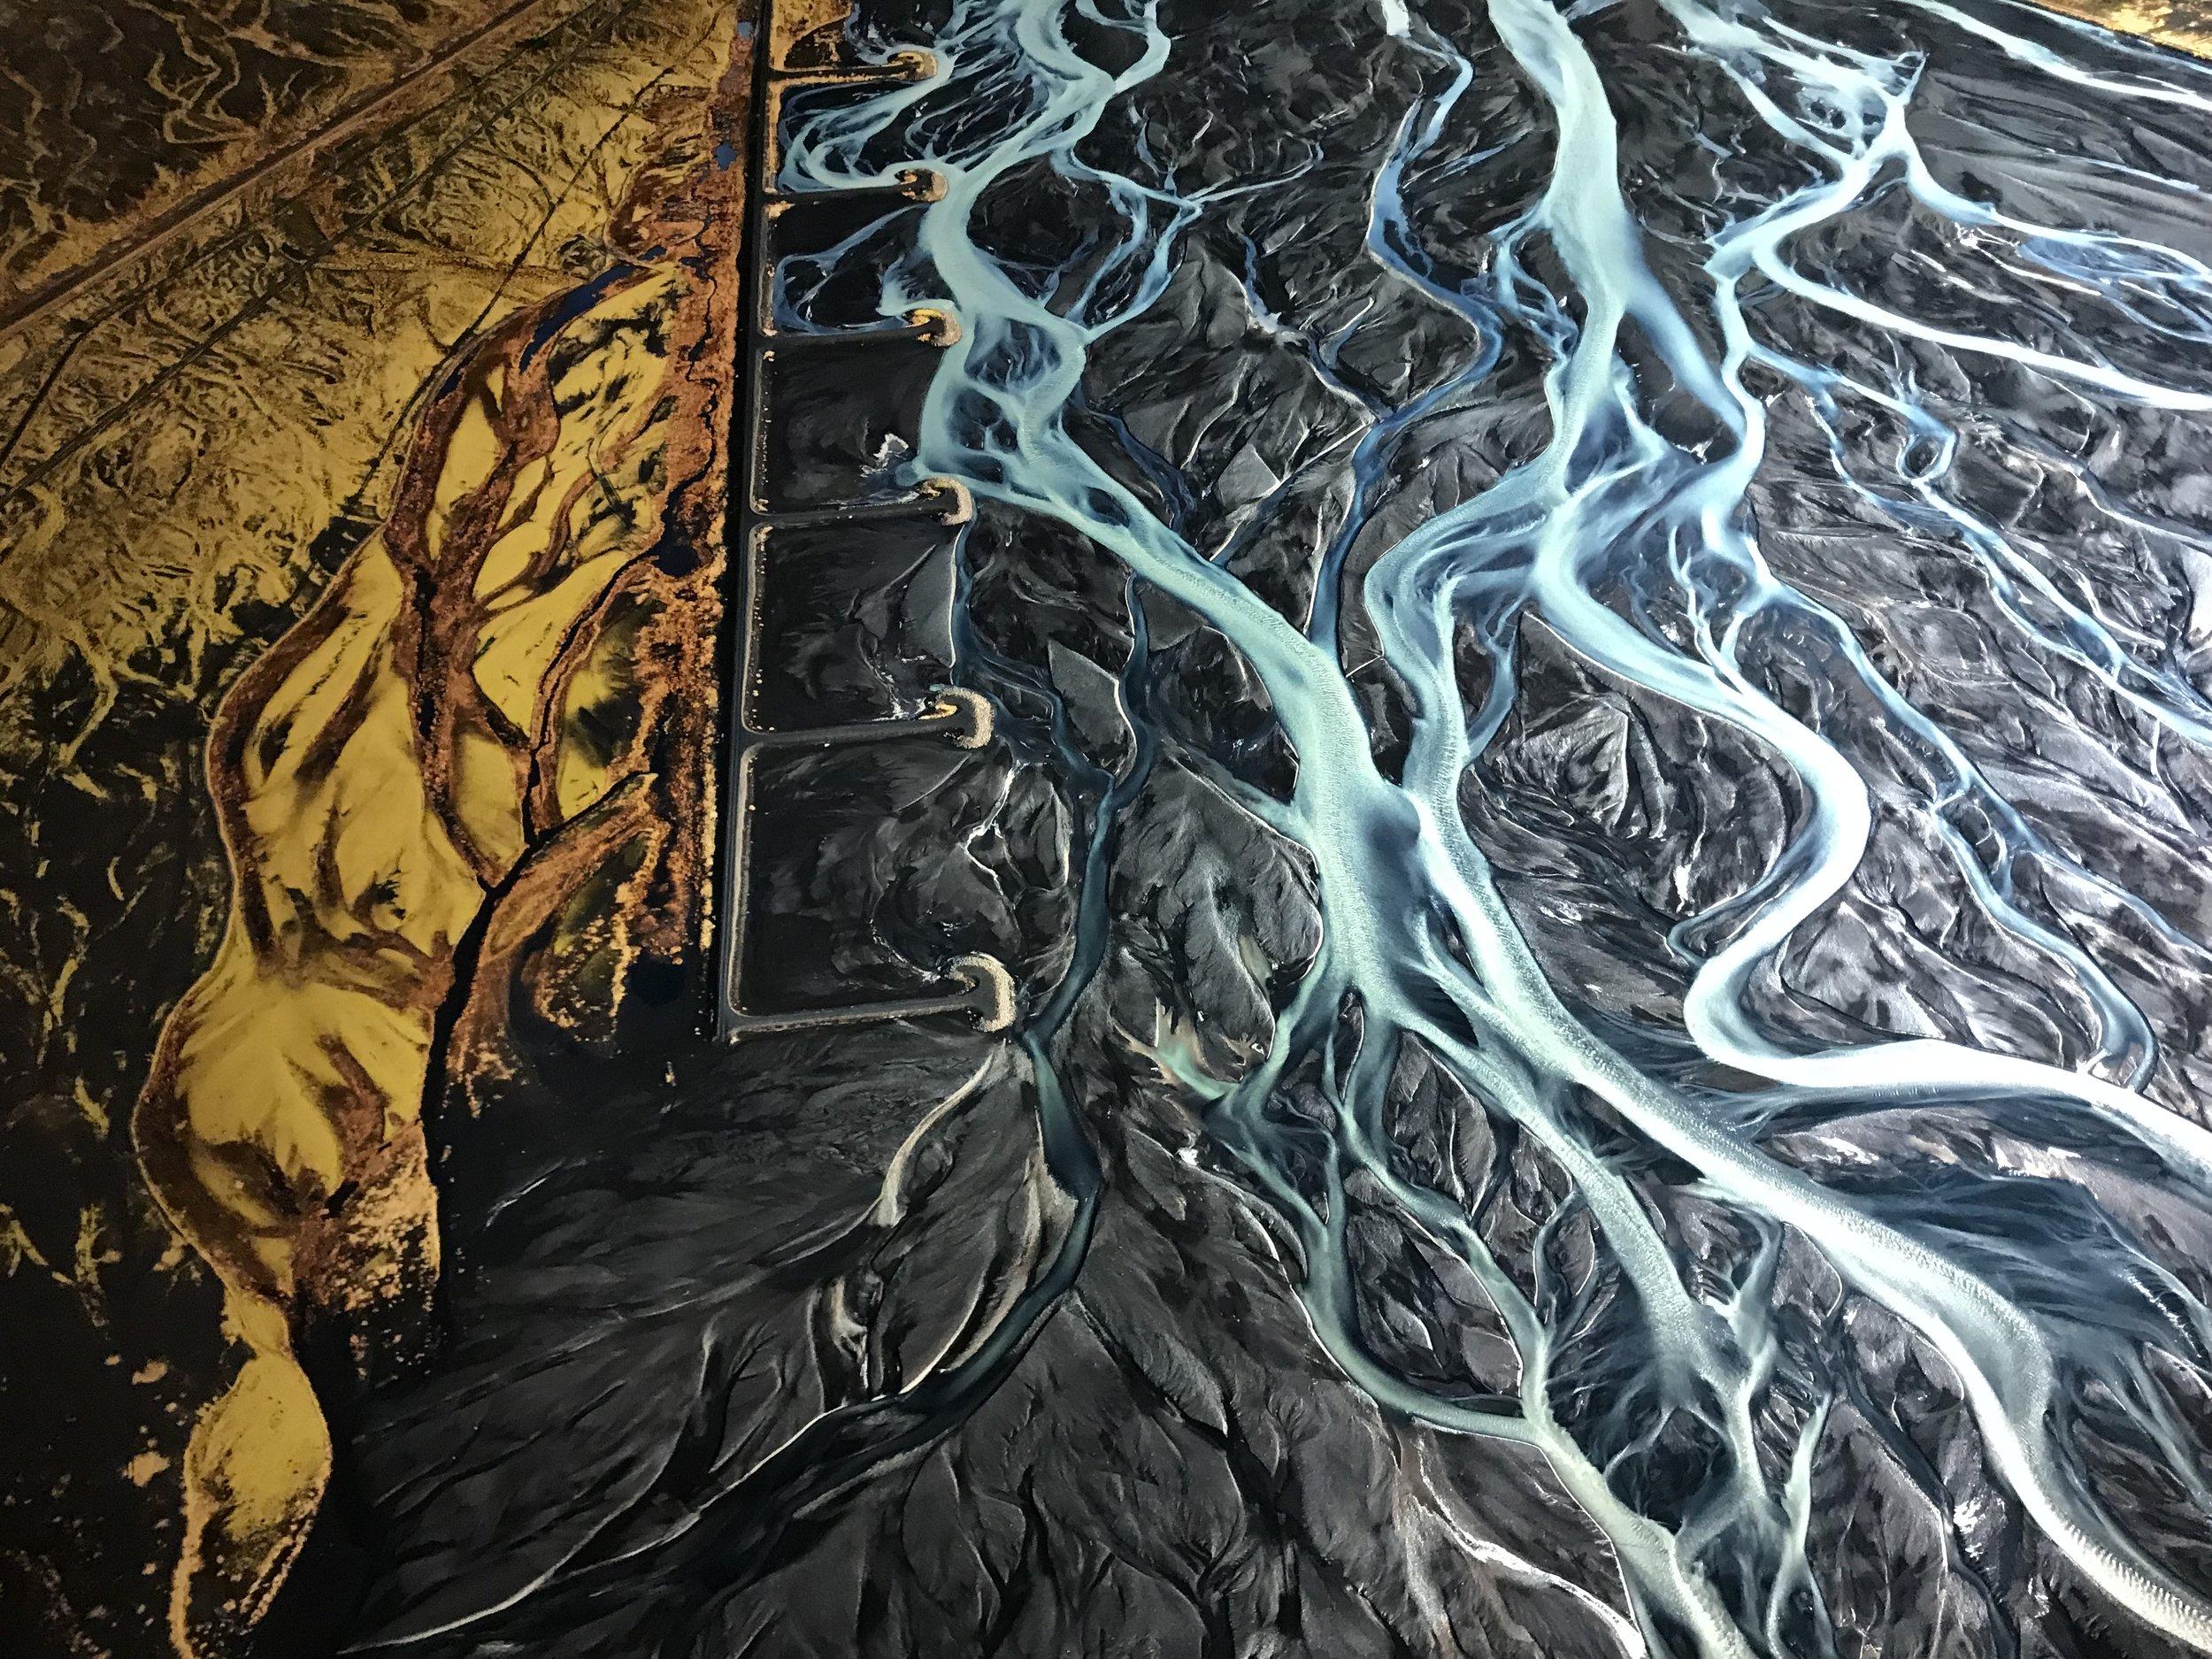 Edward Burtynsky, Markarfljot River #1, Erosion Control, Iceland 2012